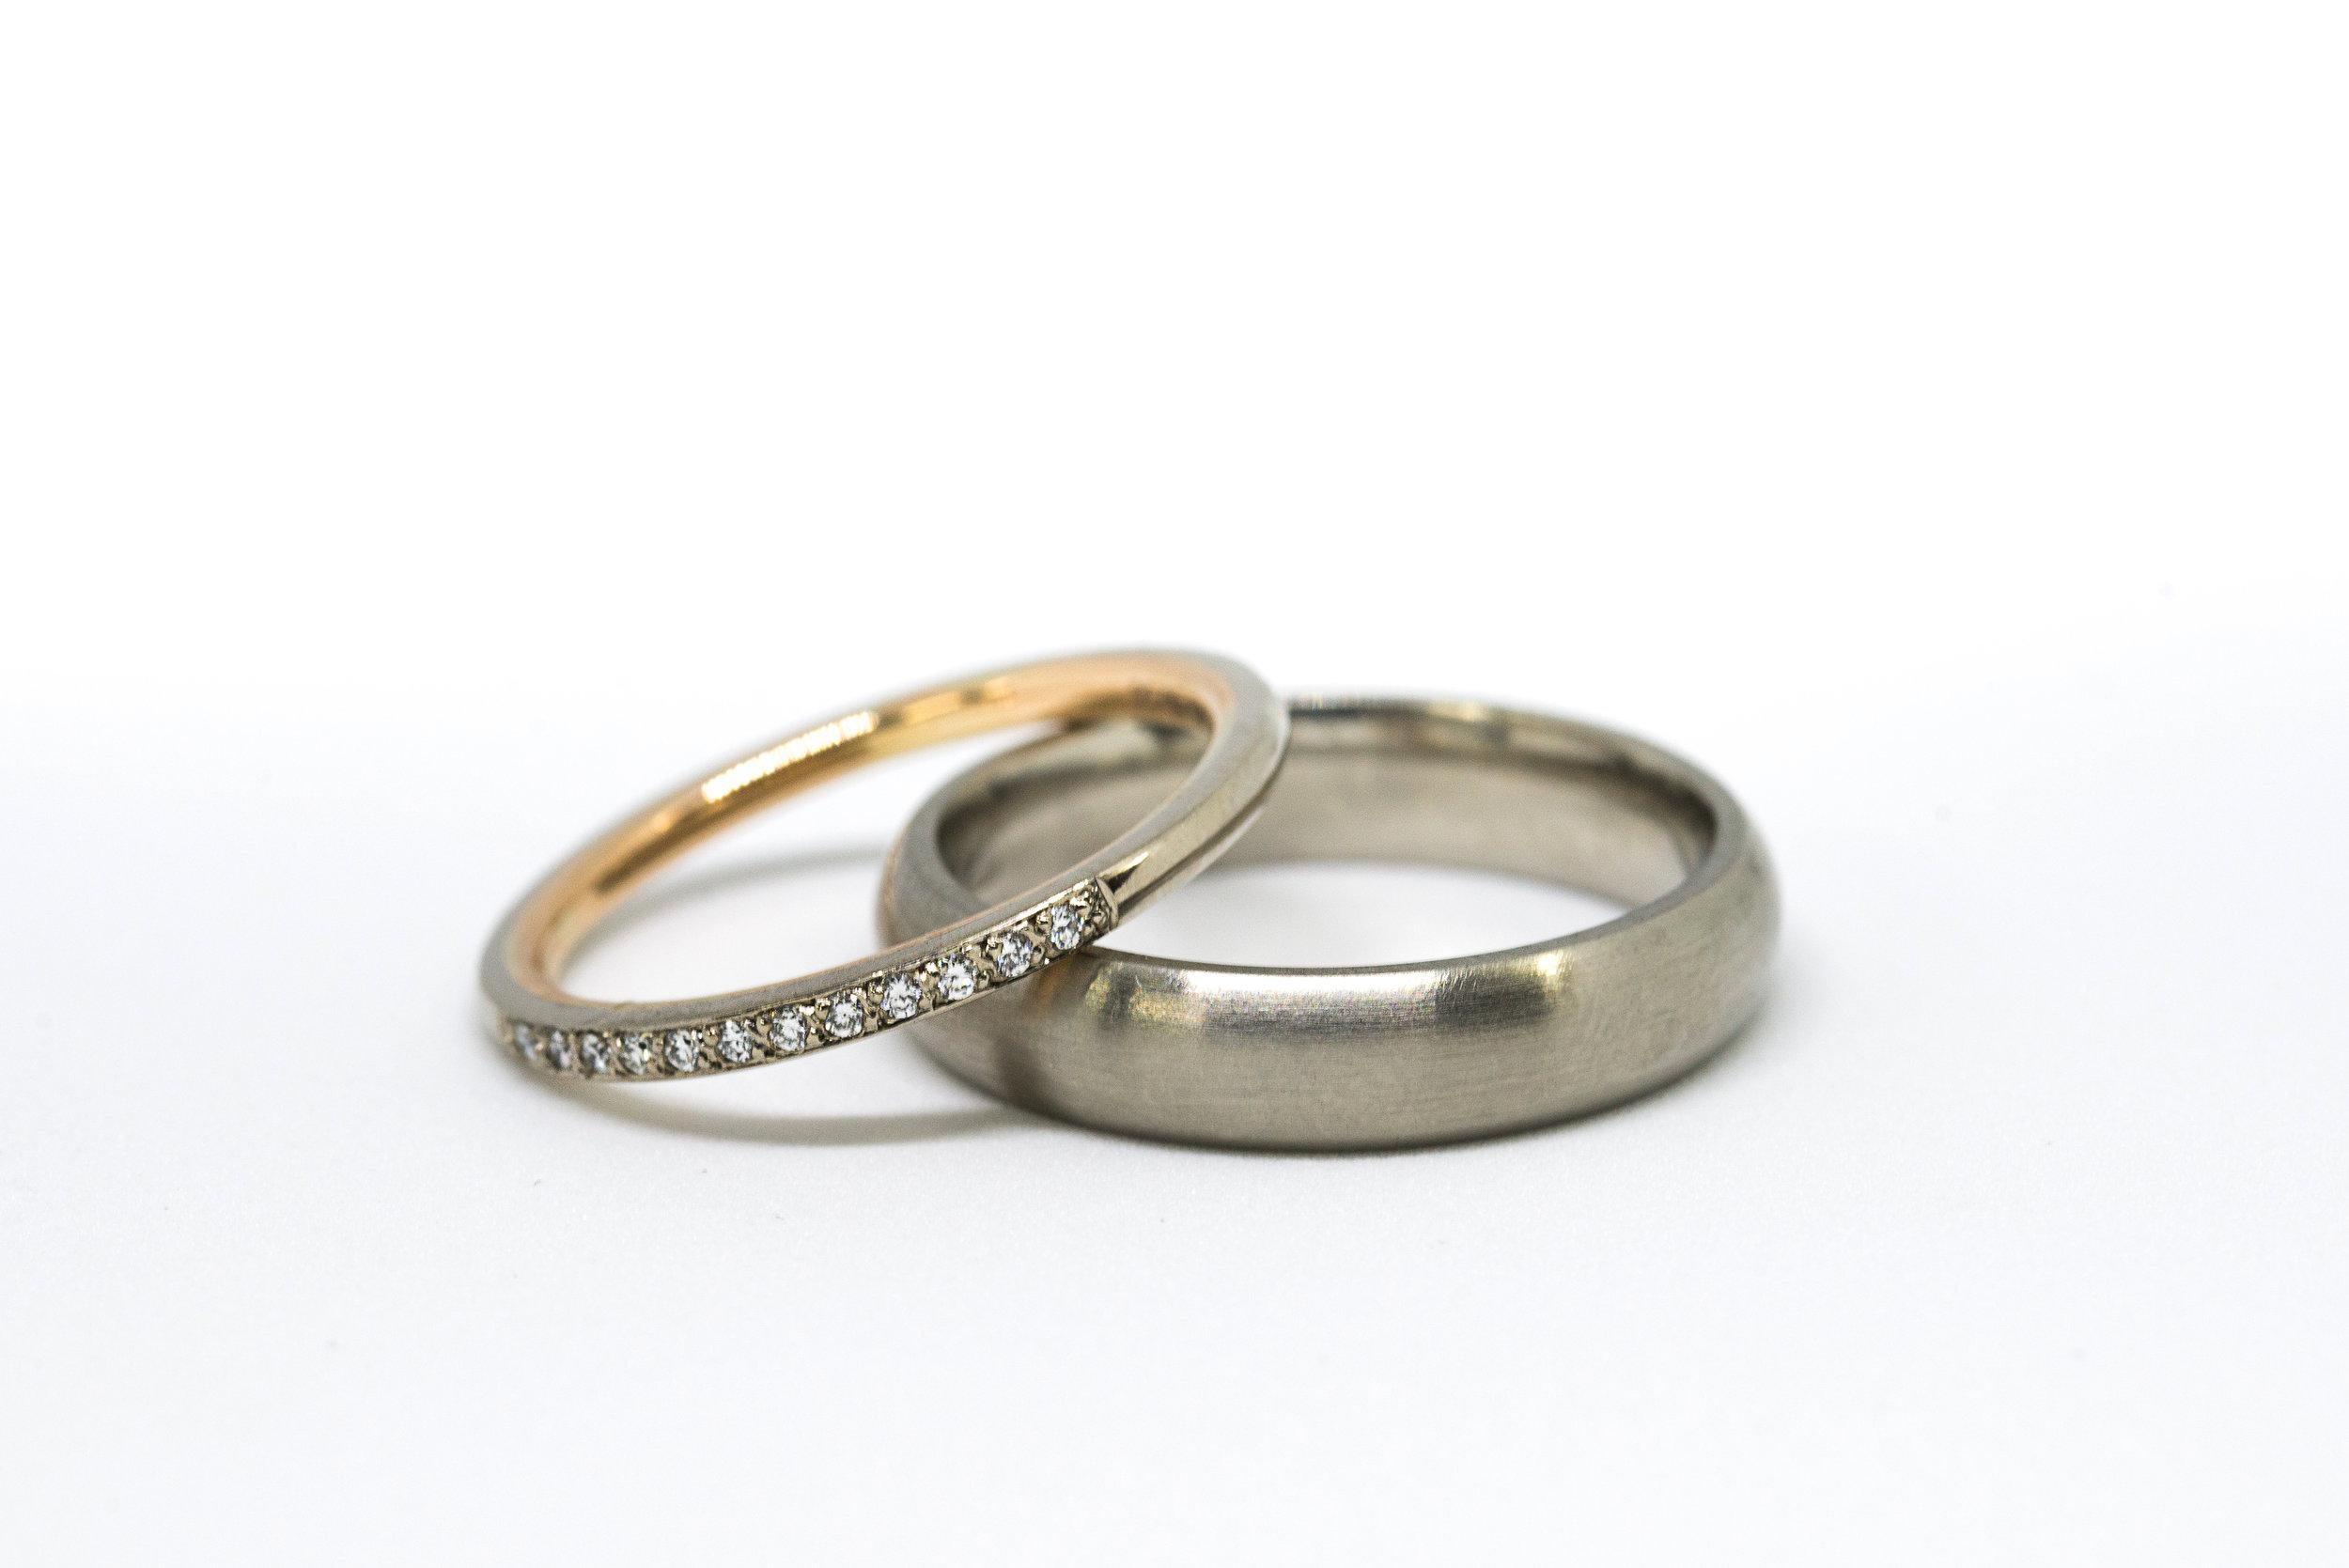 Bespoke Swindon oWedding rings